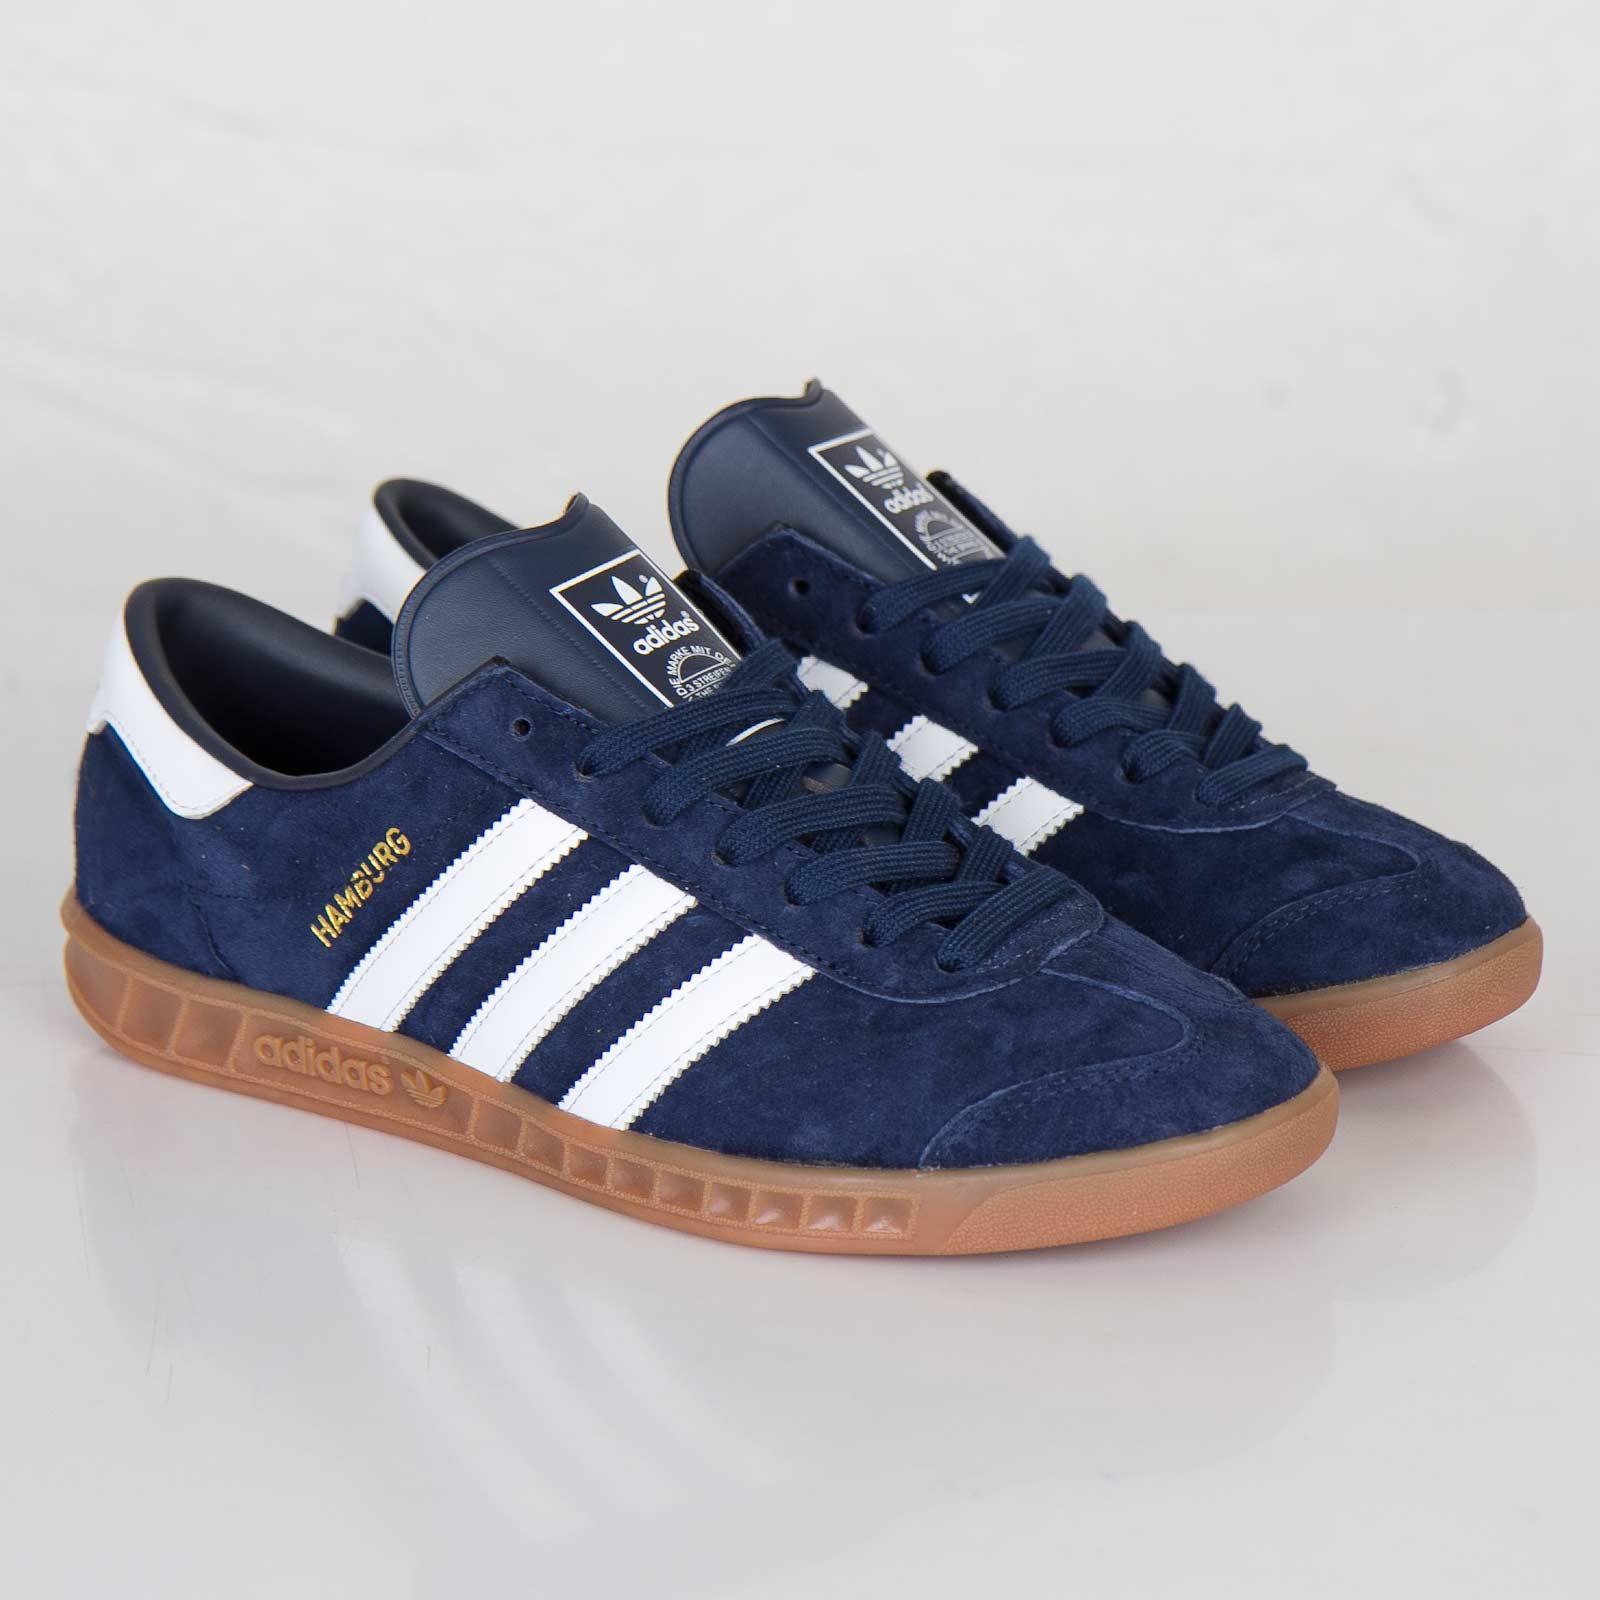 37638dd640cb adidas Hamburg - D65192 - Sneakersnstuff